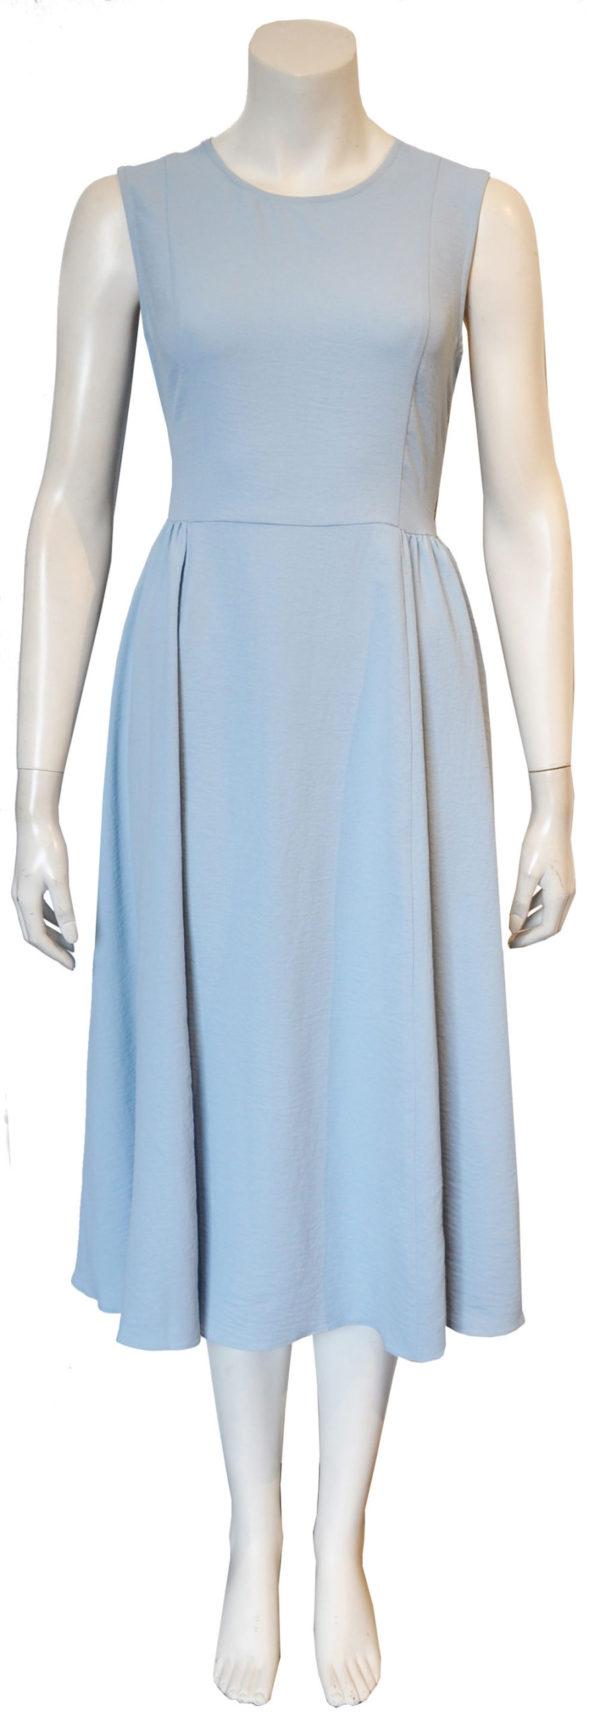 blue cross back dress- front